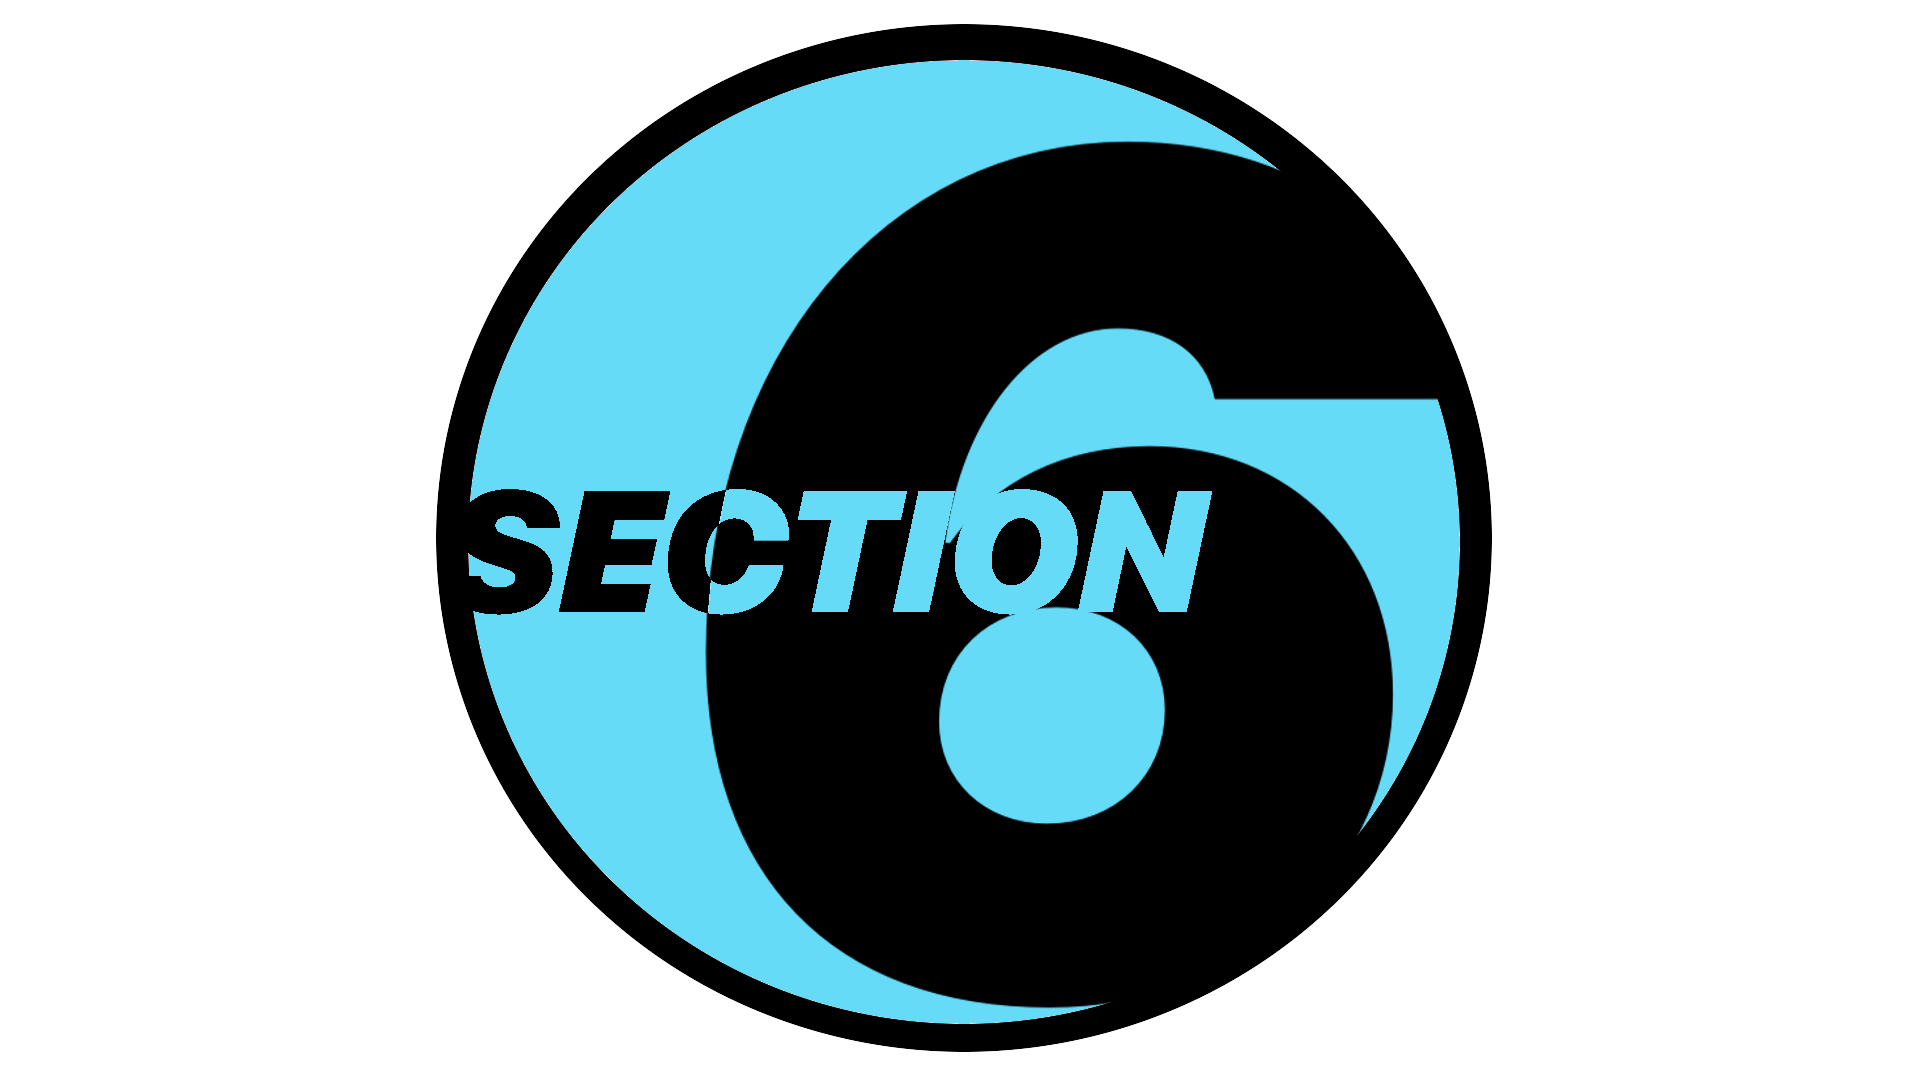 SECTION6LOGOblueblack.png